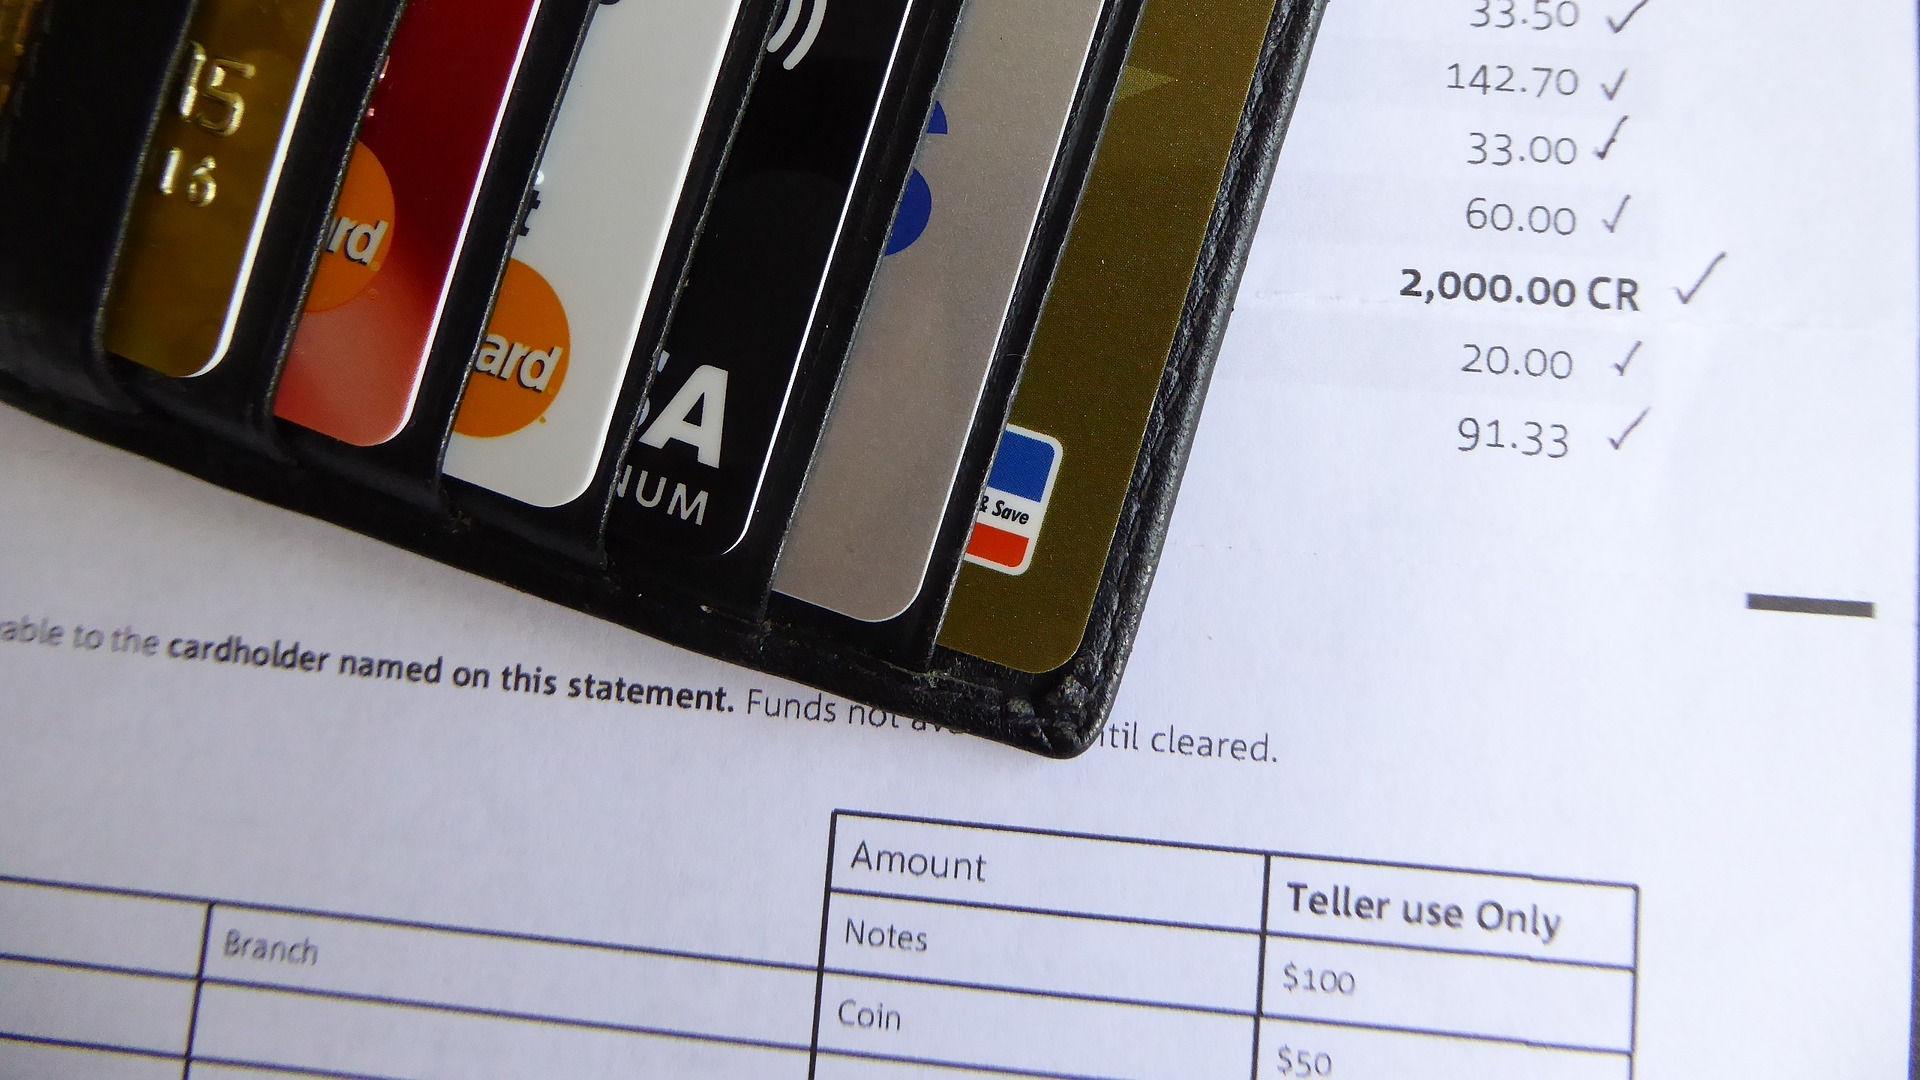 Bank statement. Photo credit: lcb on Pixabay